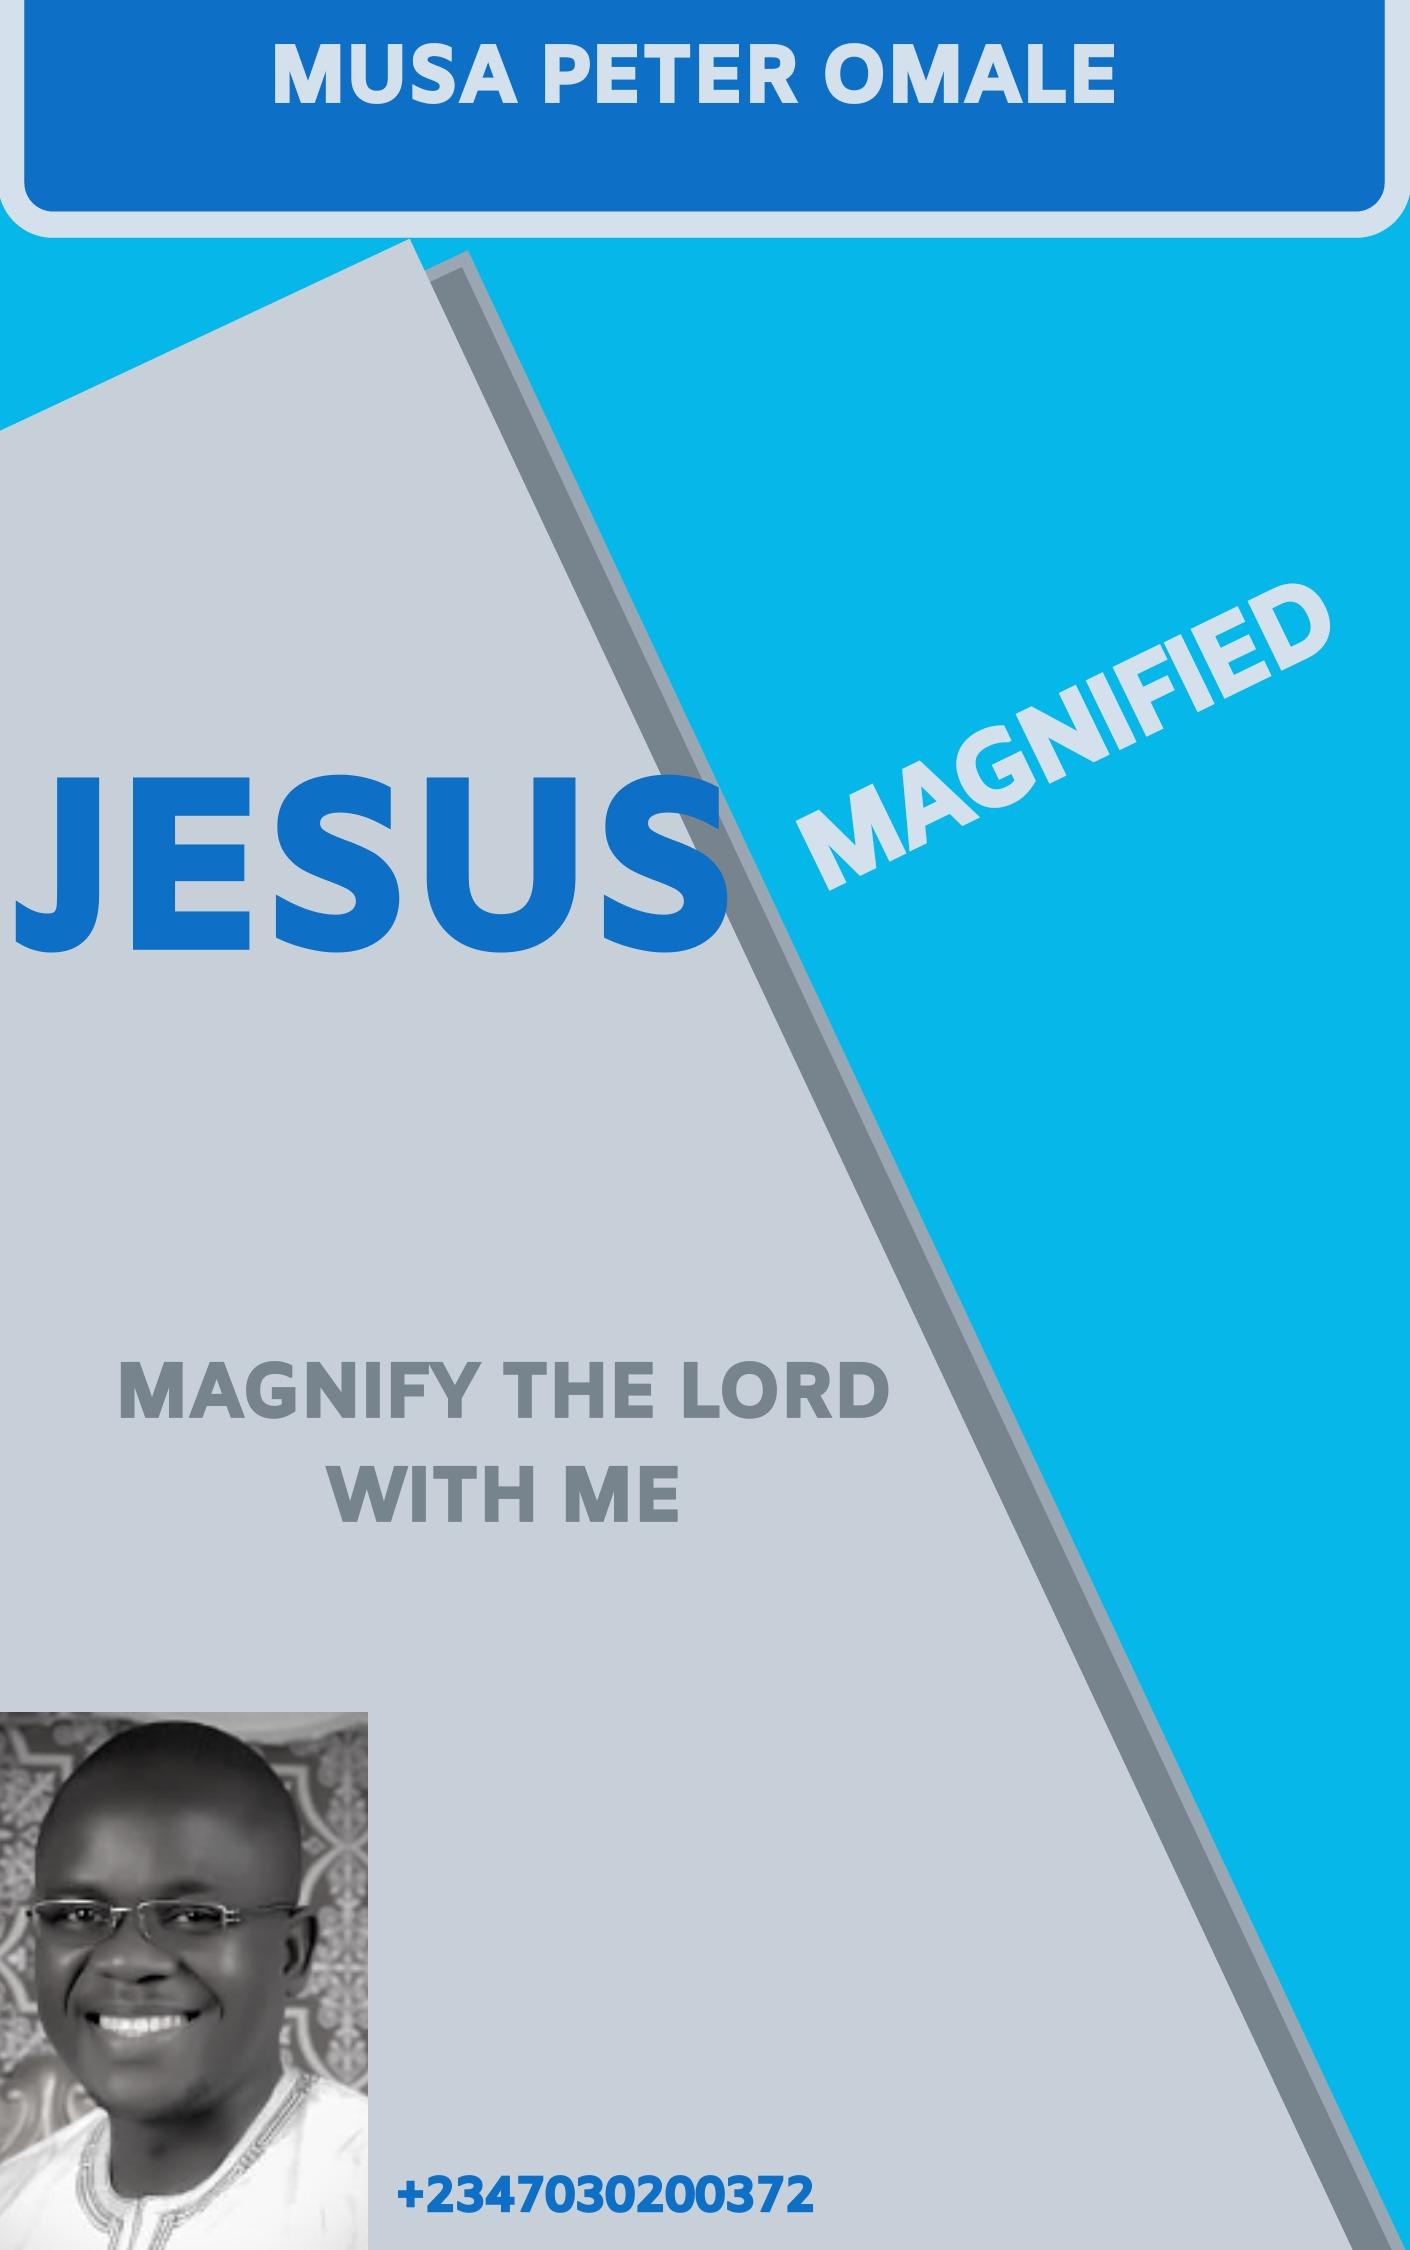 JESUS MAGNIFIED